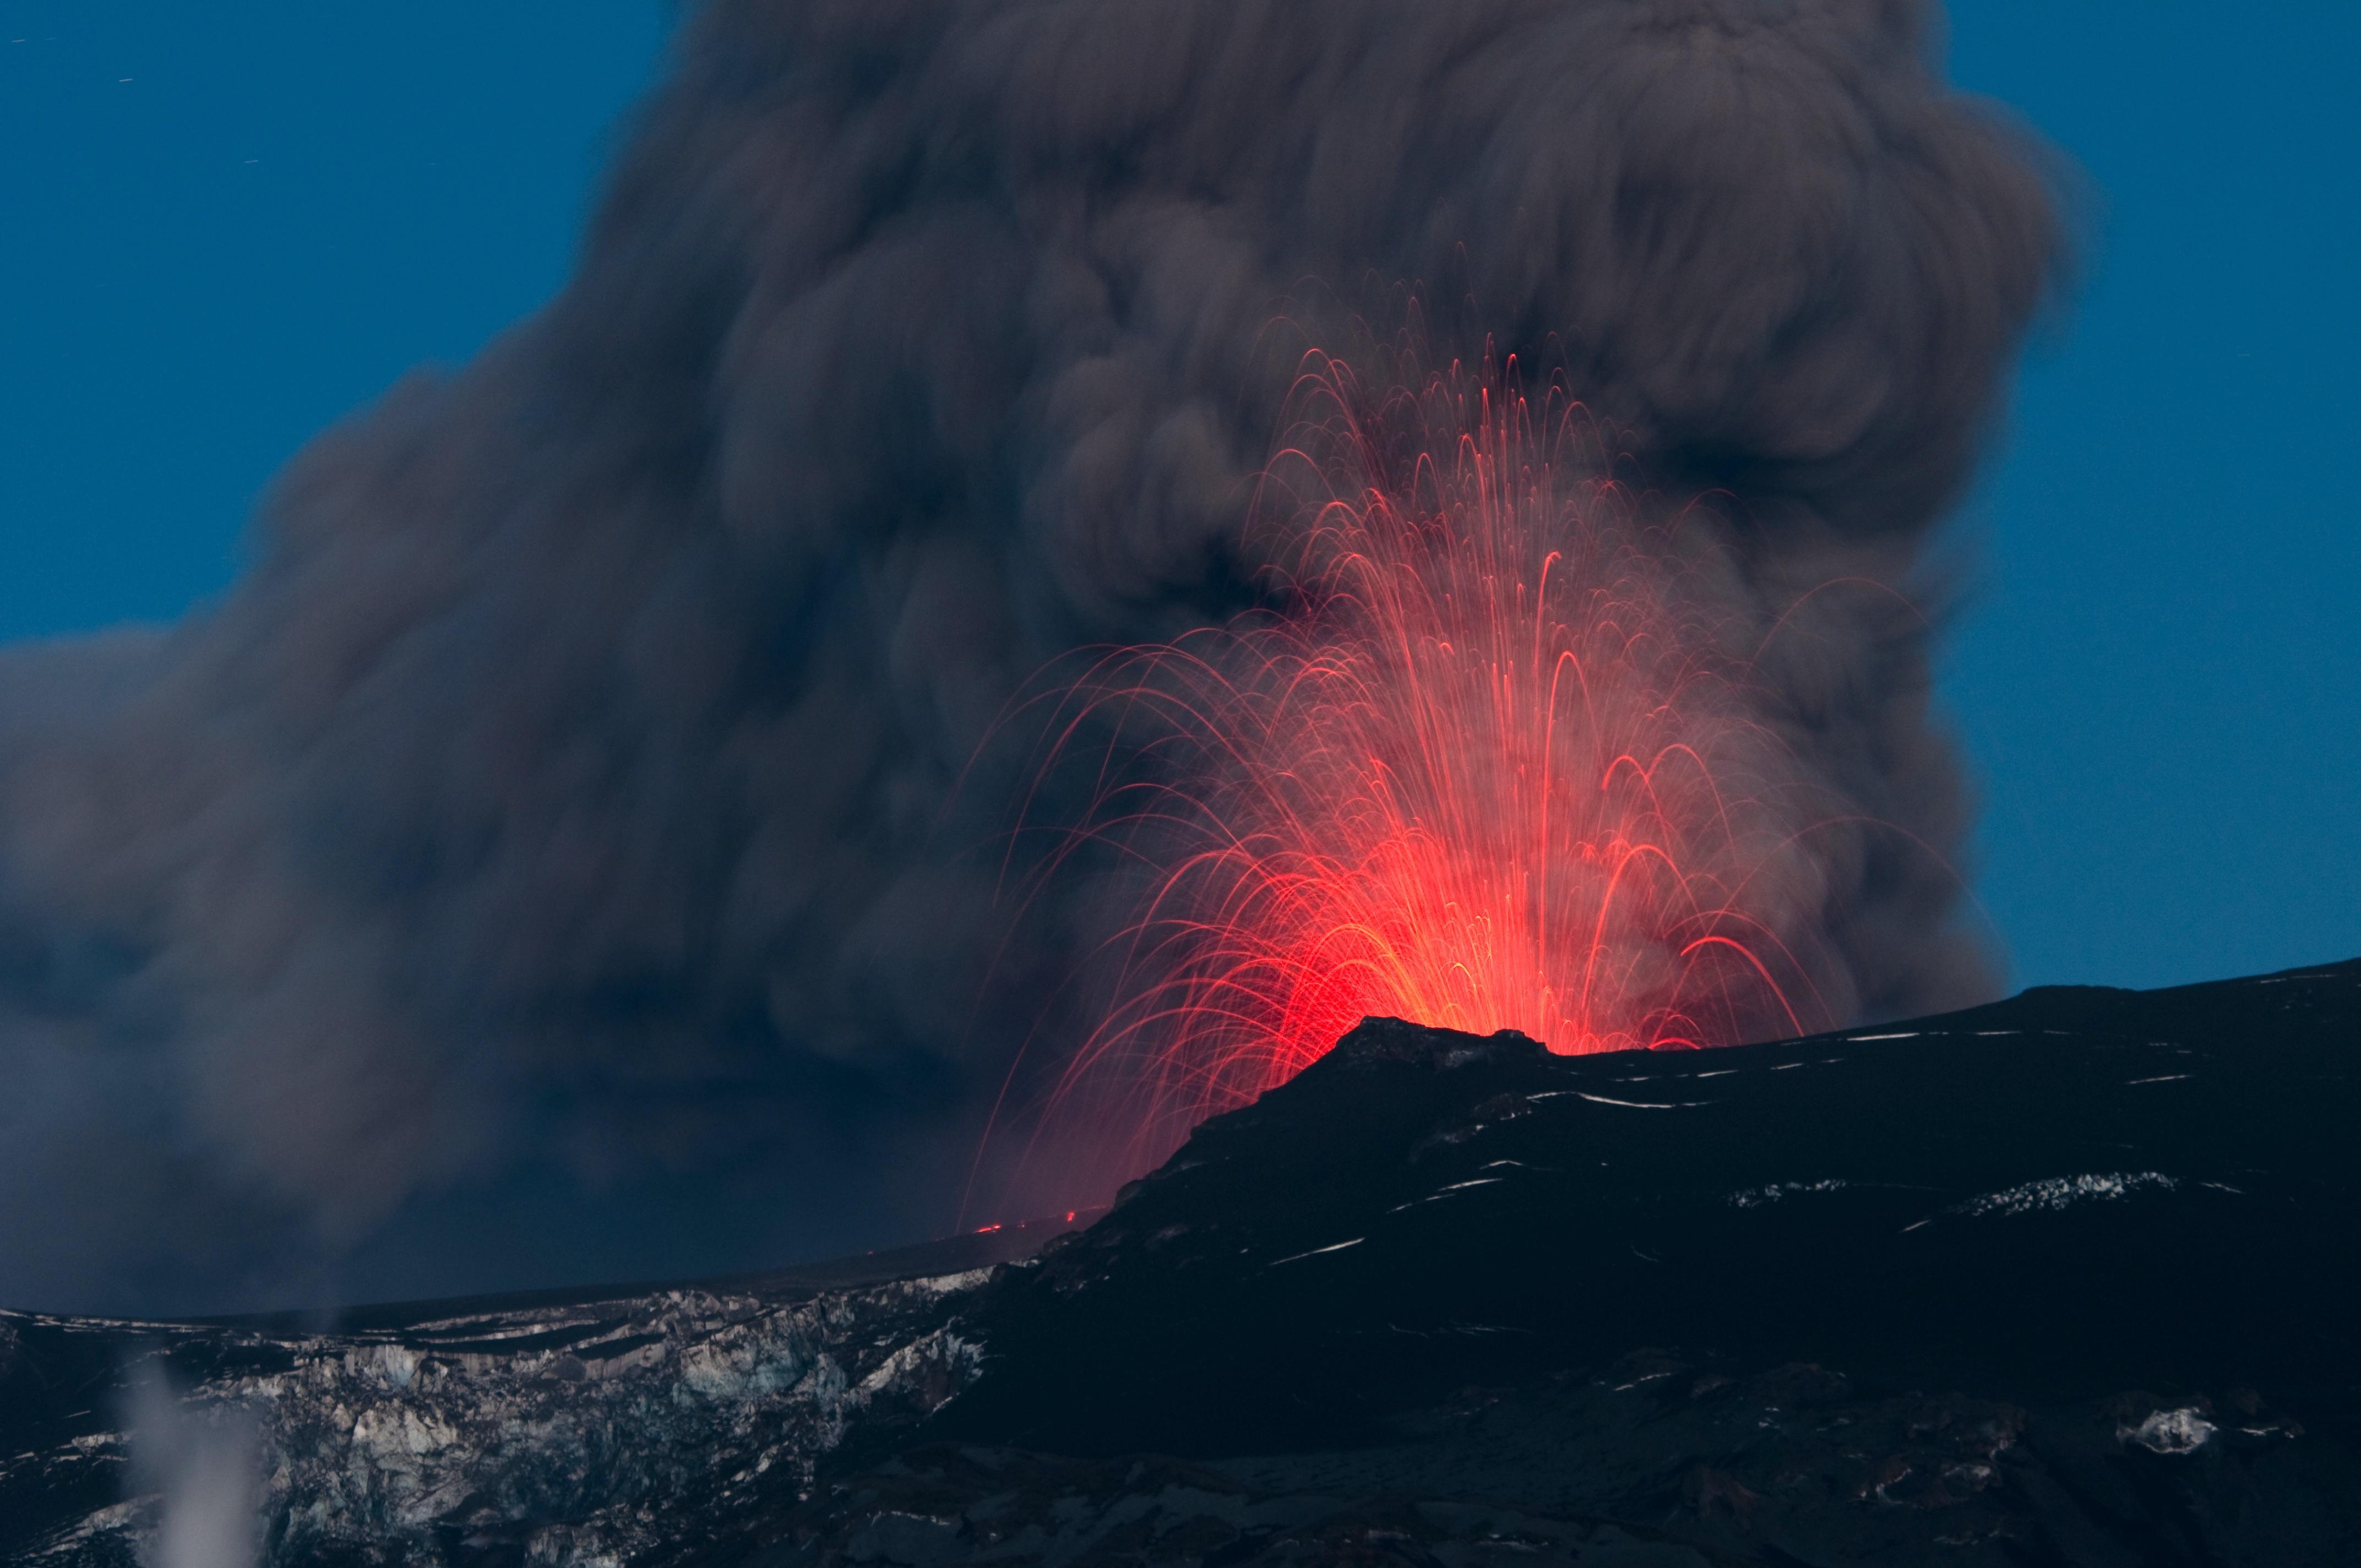 Eruption of the Icelandic volcano Eyjafjallajökull